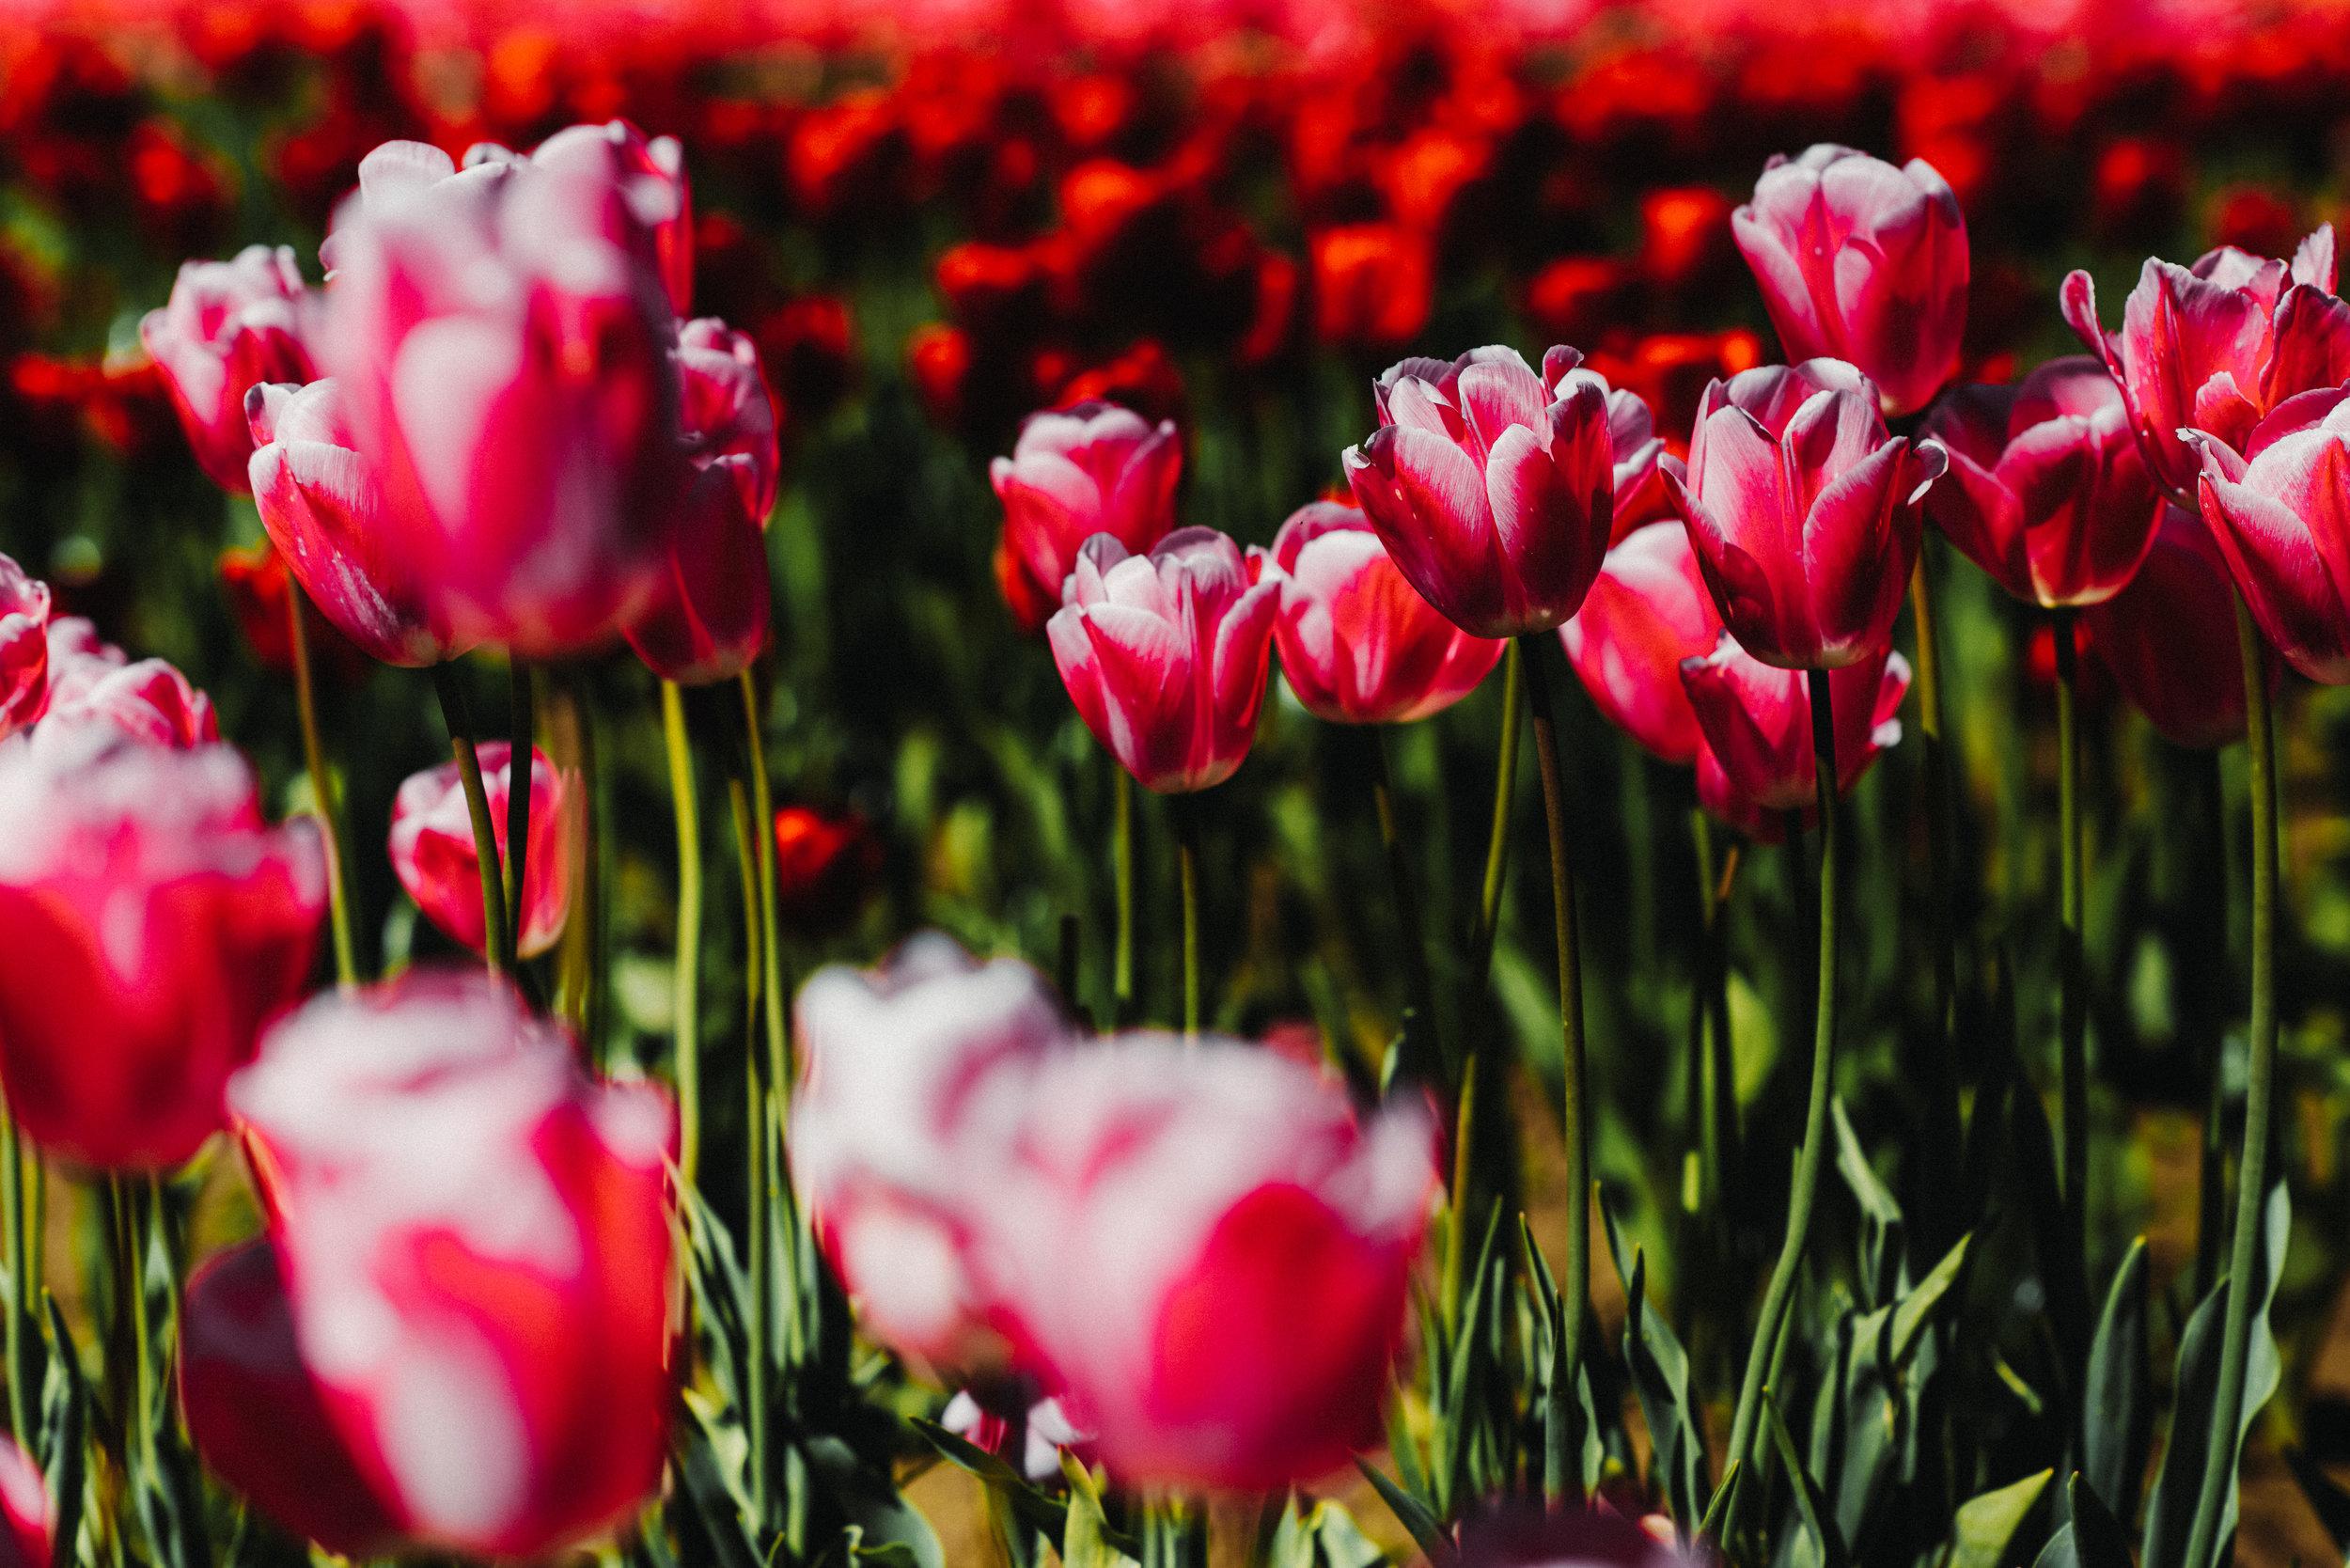 green floral dress tulip farm-3013